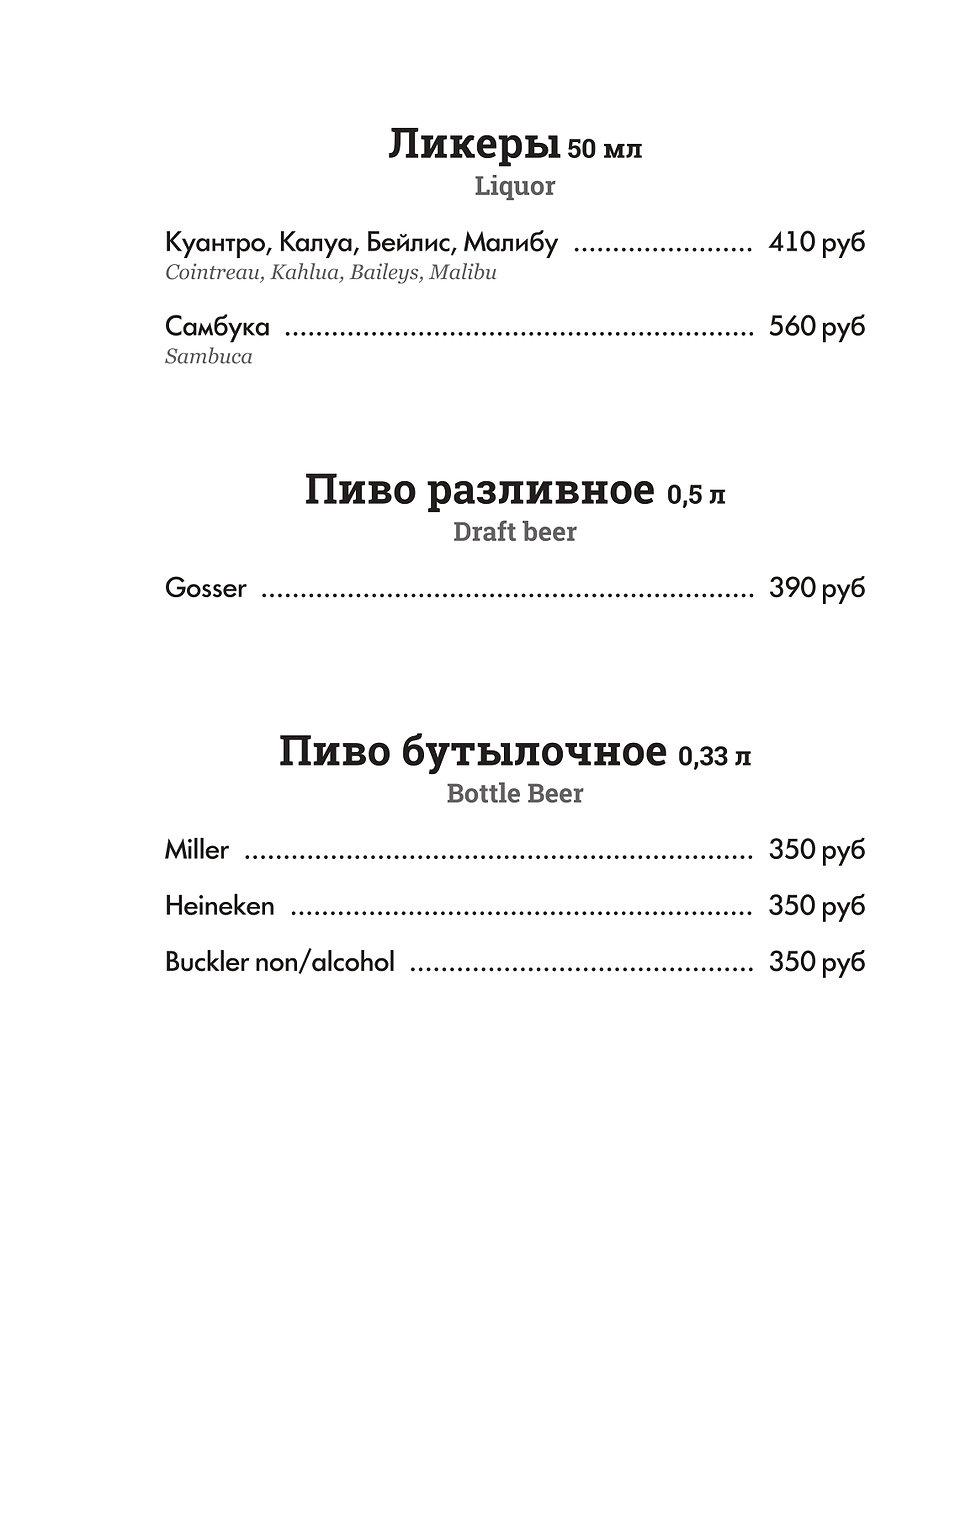 S46_bar_2021_ (2)_page-0013.jpg